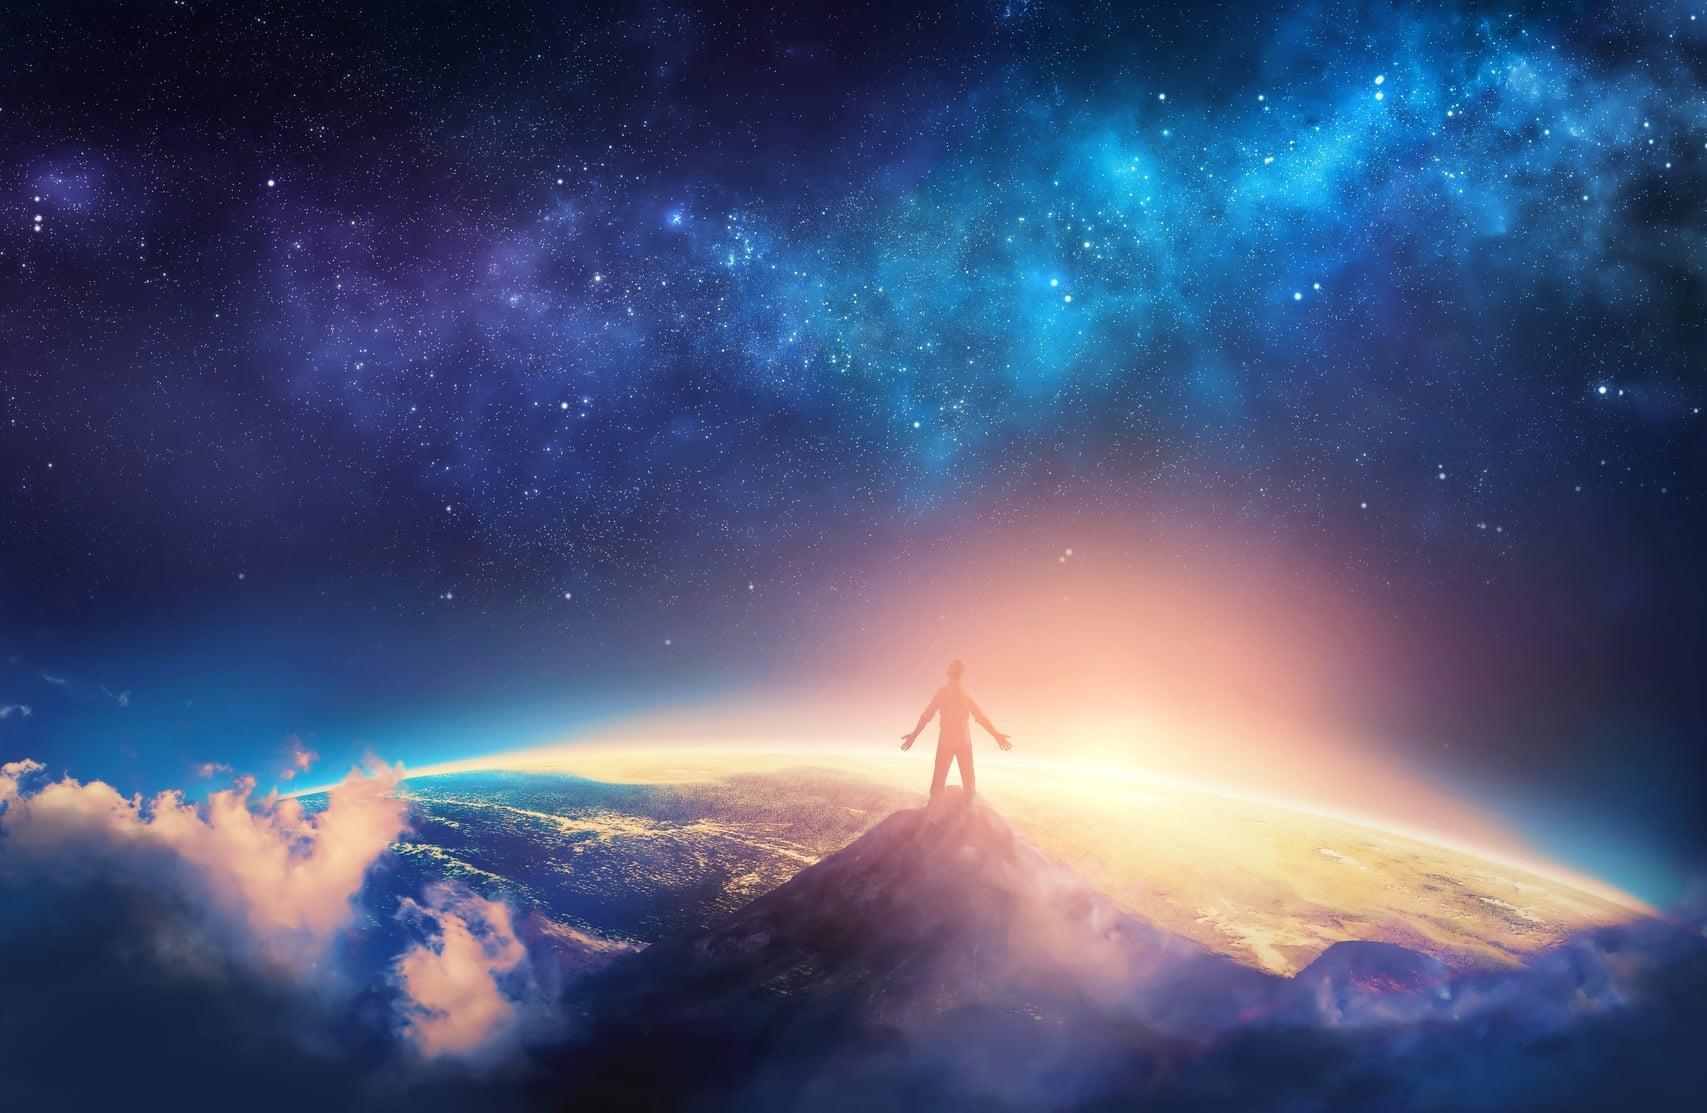 Apocalipse 14:6-12 e os Três Últimos Recados de Deus para a Humanidade